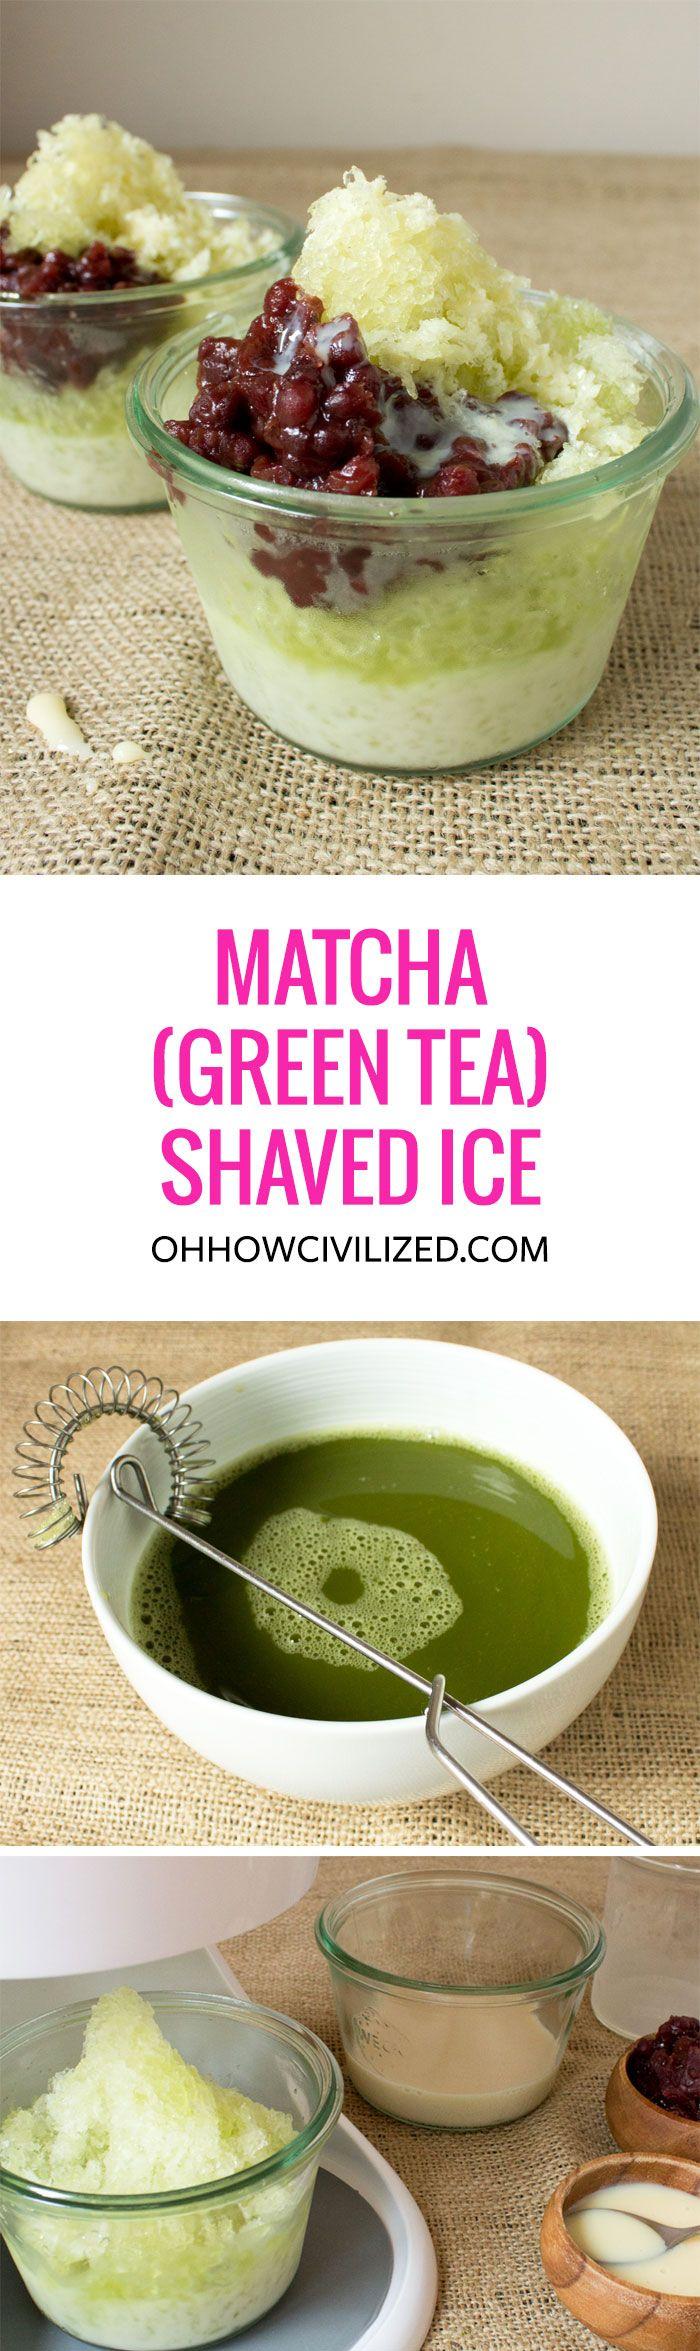 Matcha (Green Tea) Shaved Ice